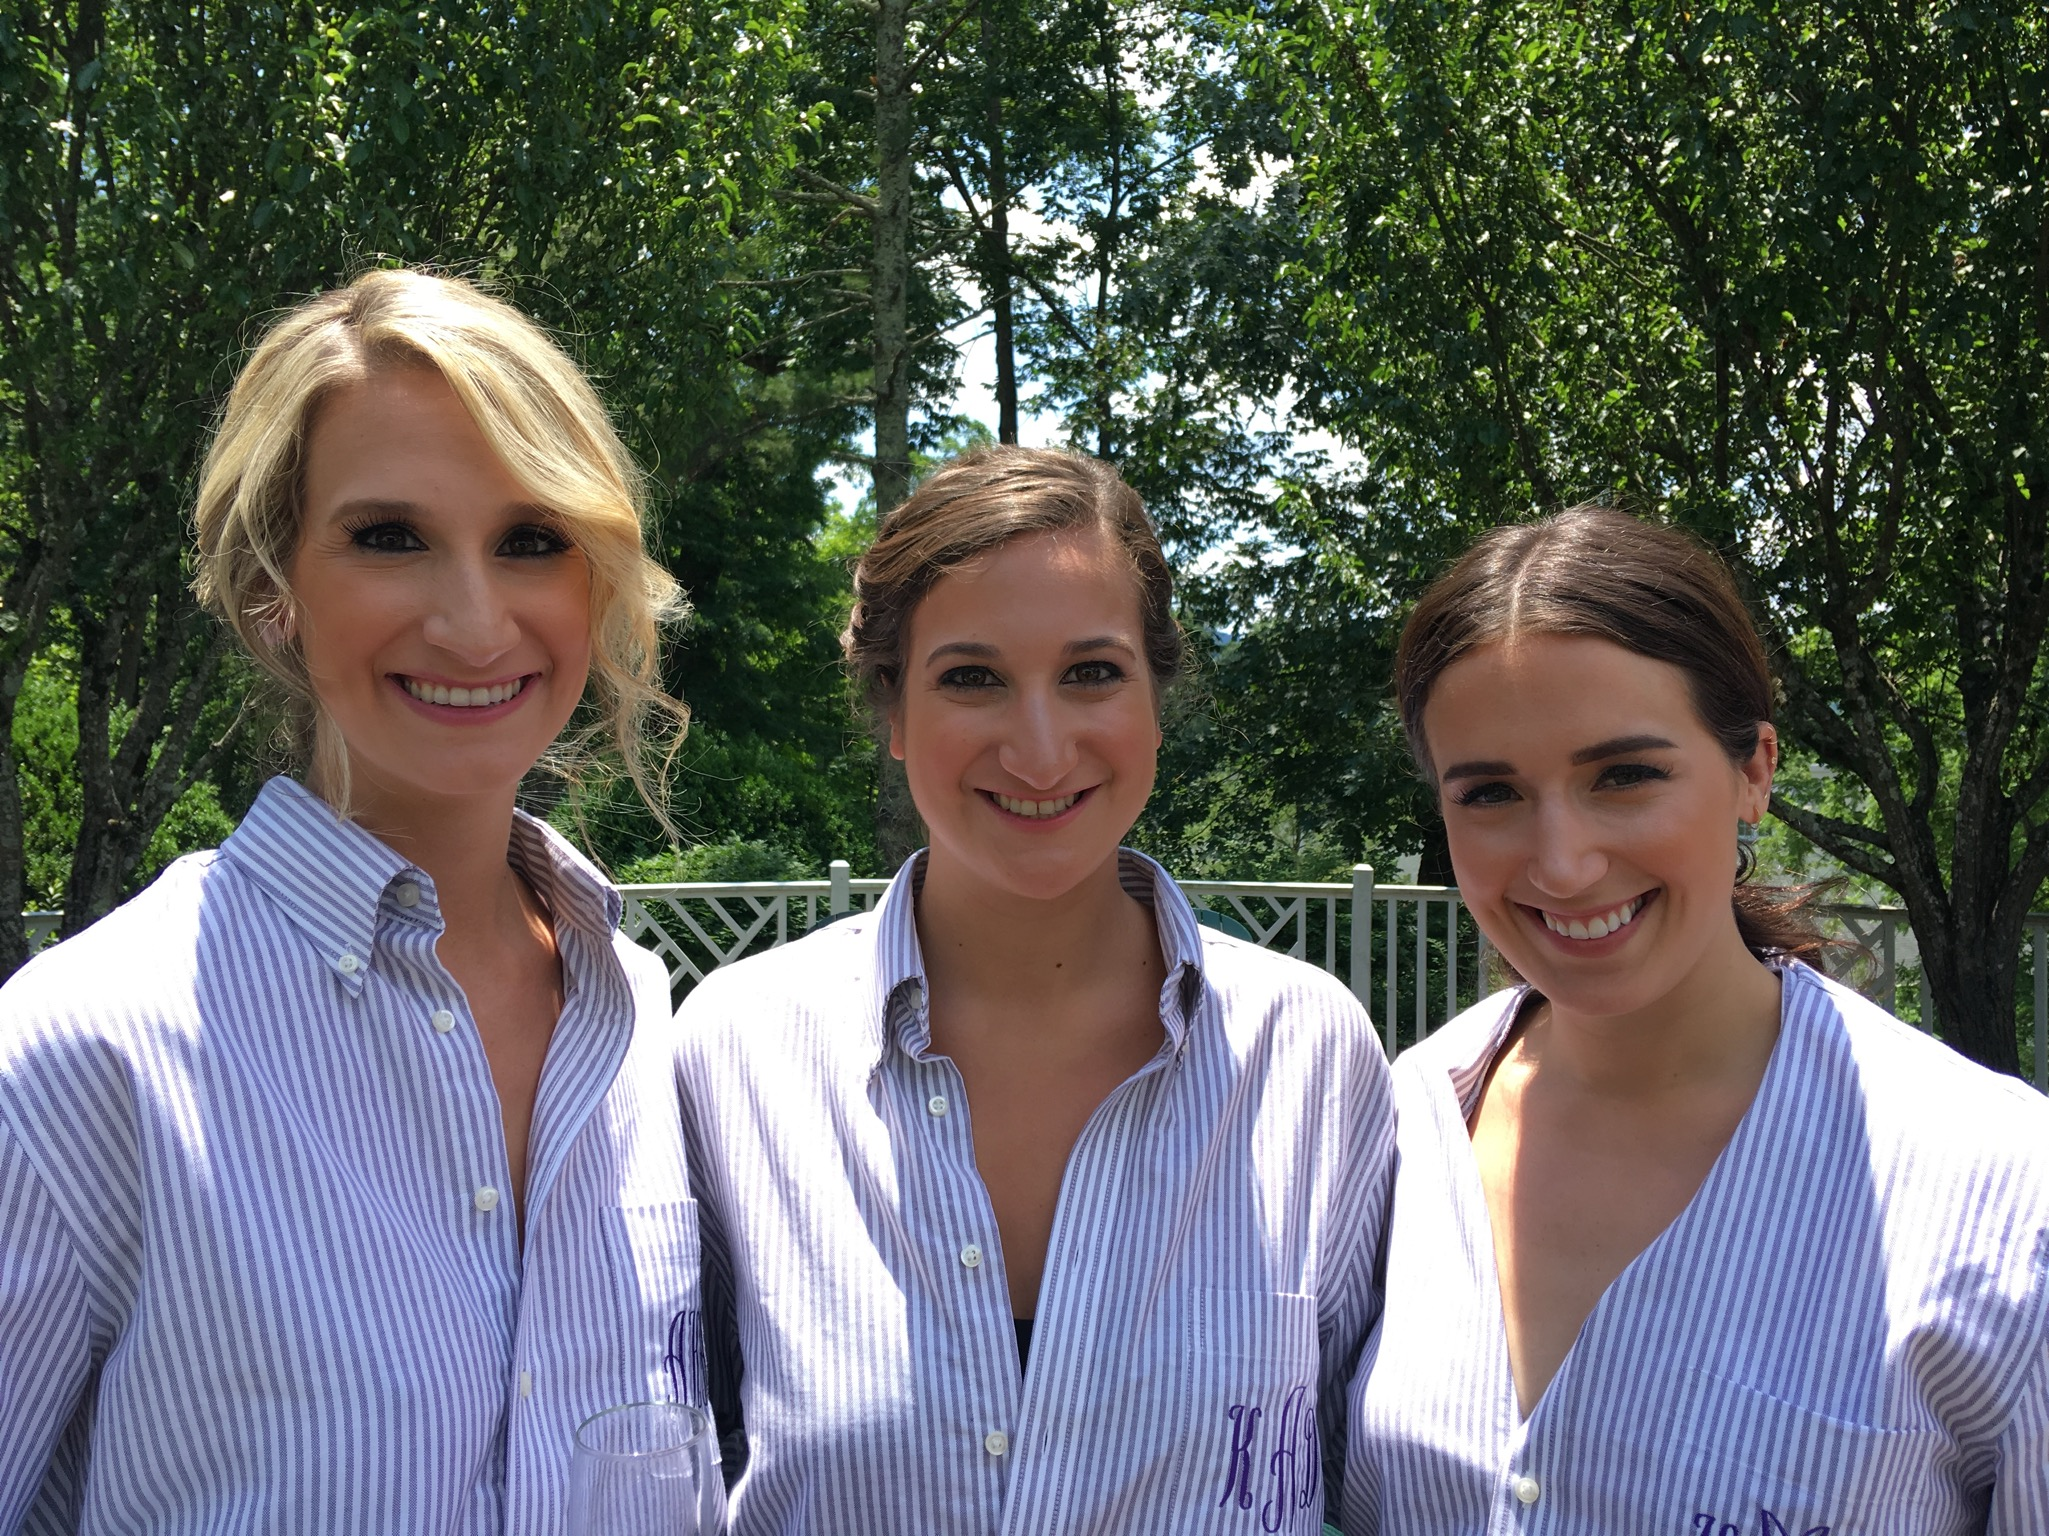 A few of Laura's maids